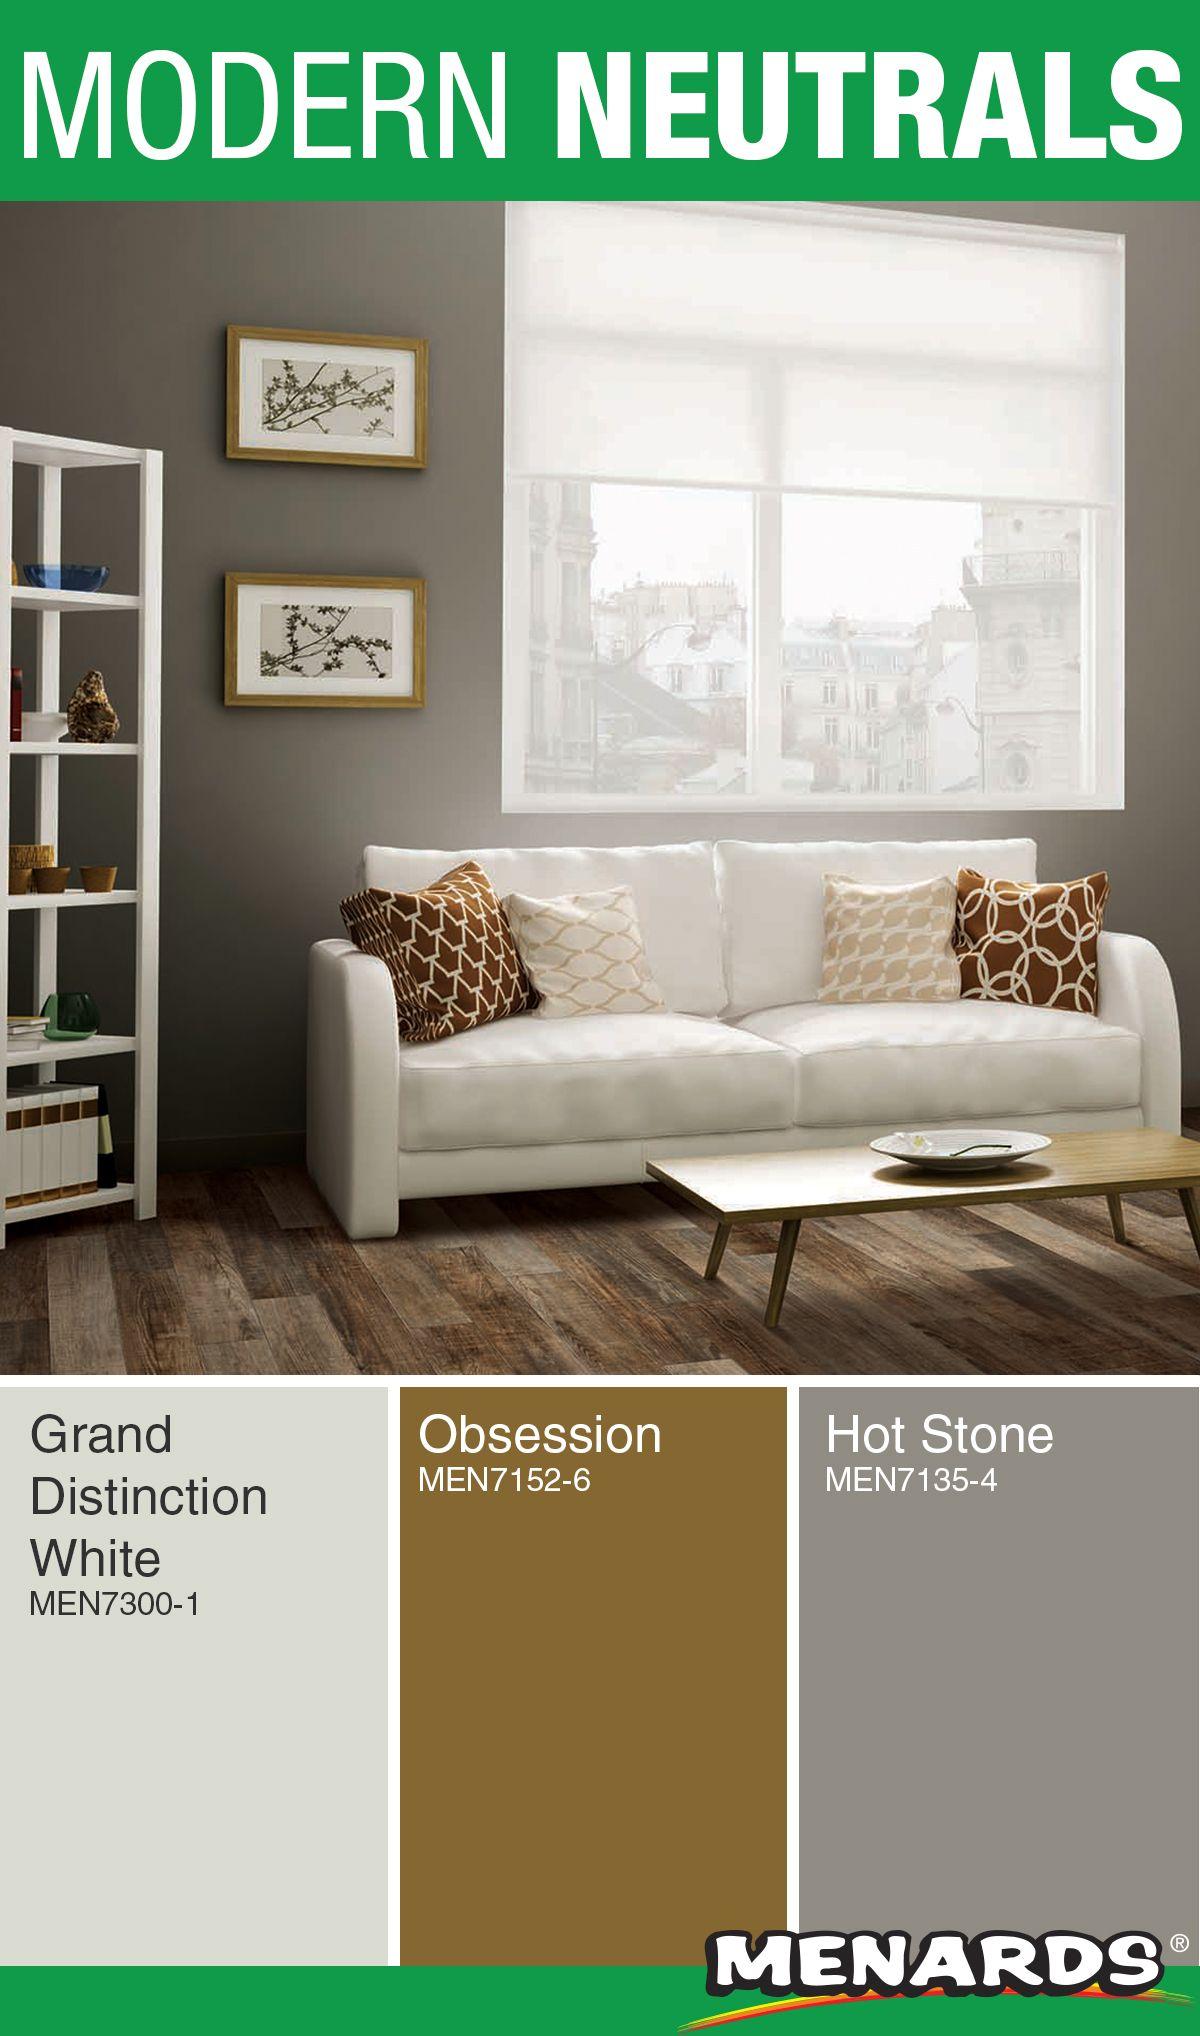 Menards Paint Colors, Menards Living Room Furniture